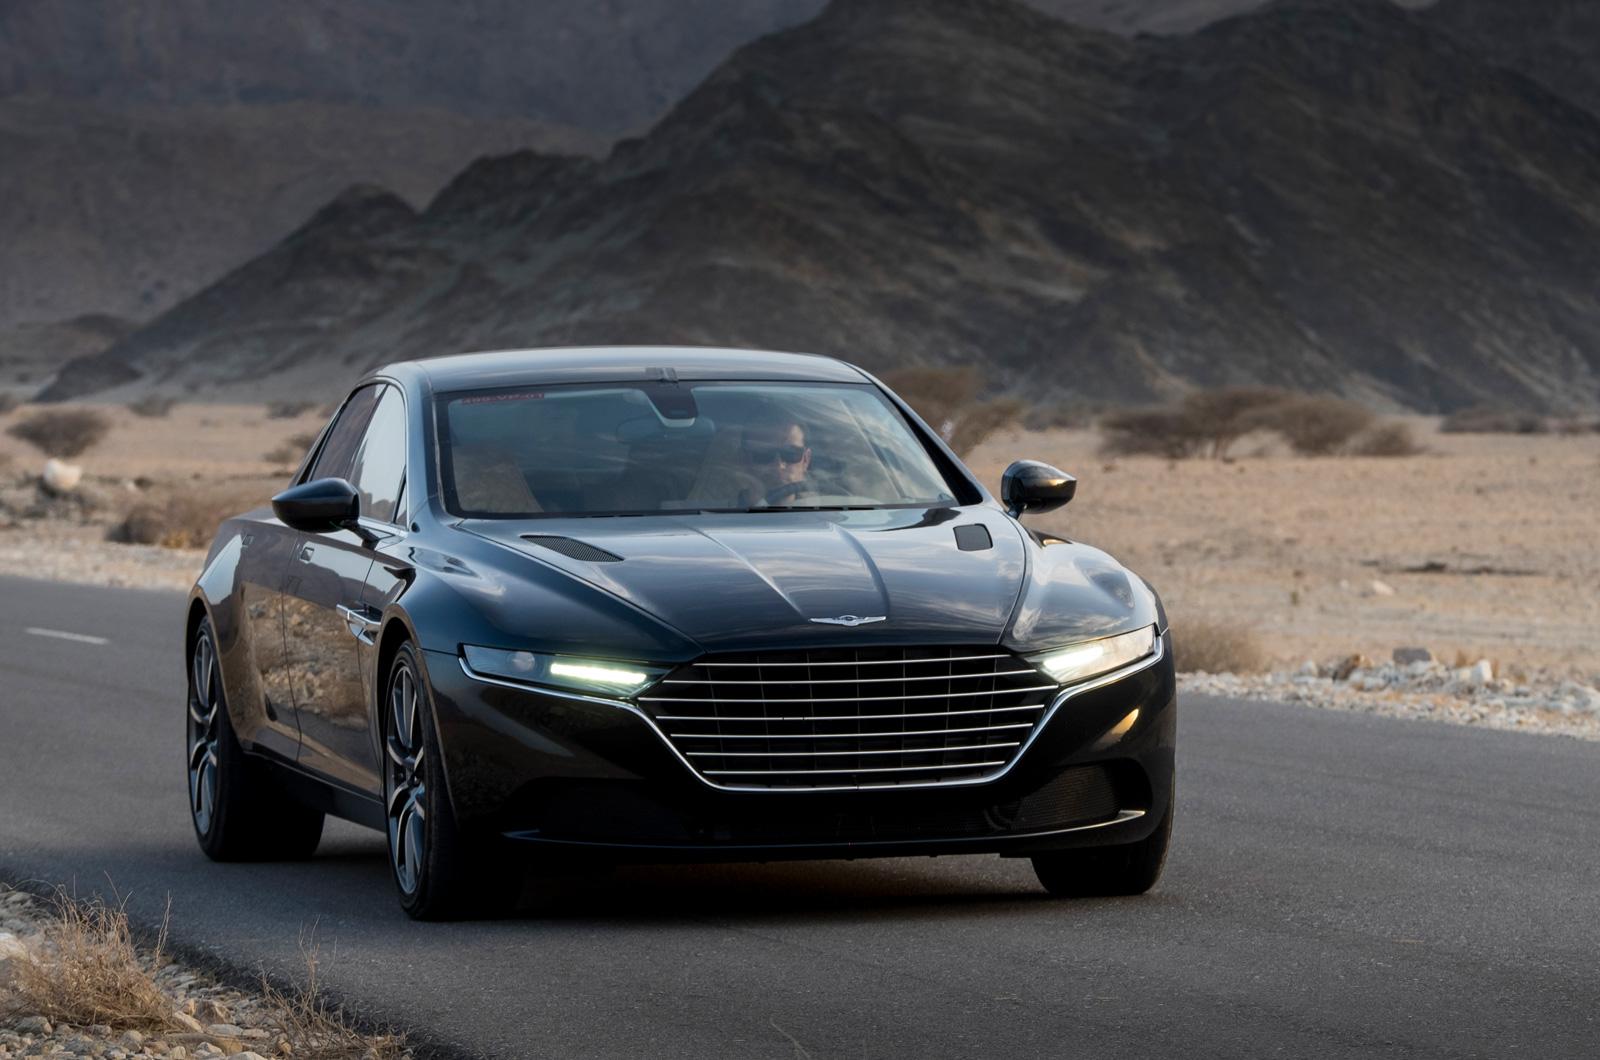 Aston Martin Drops New Photos Of Lagonda Saloon